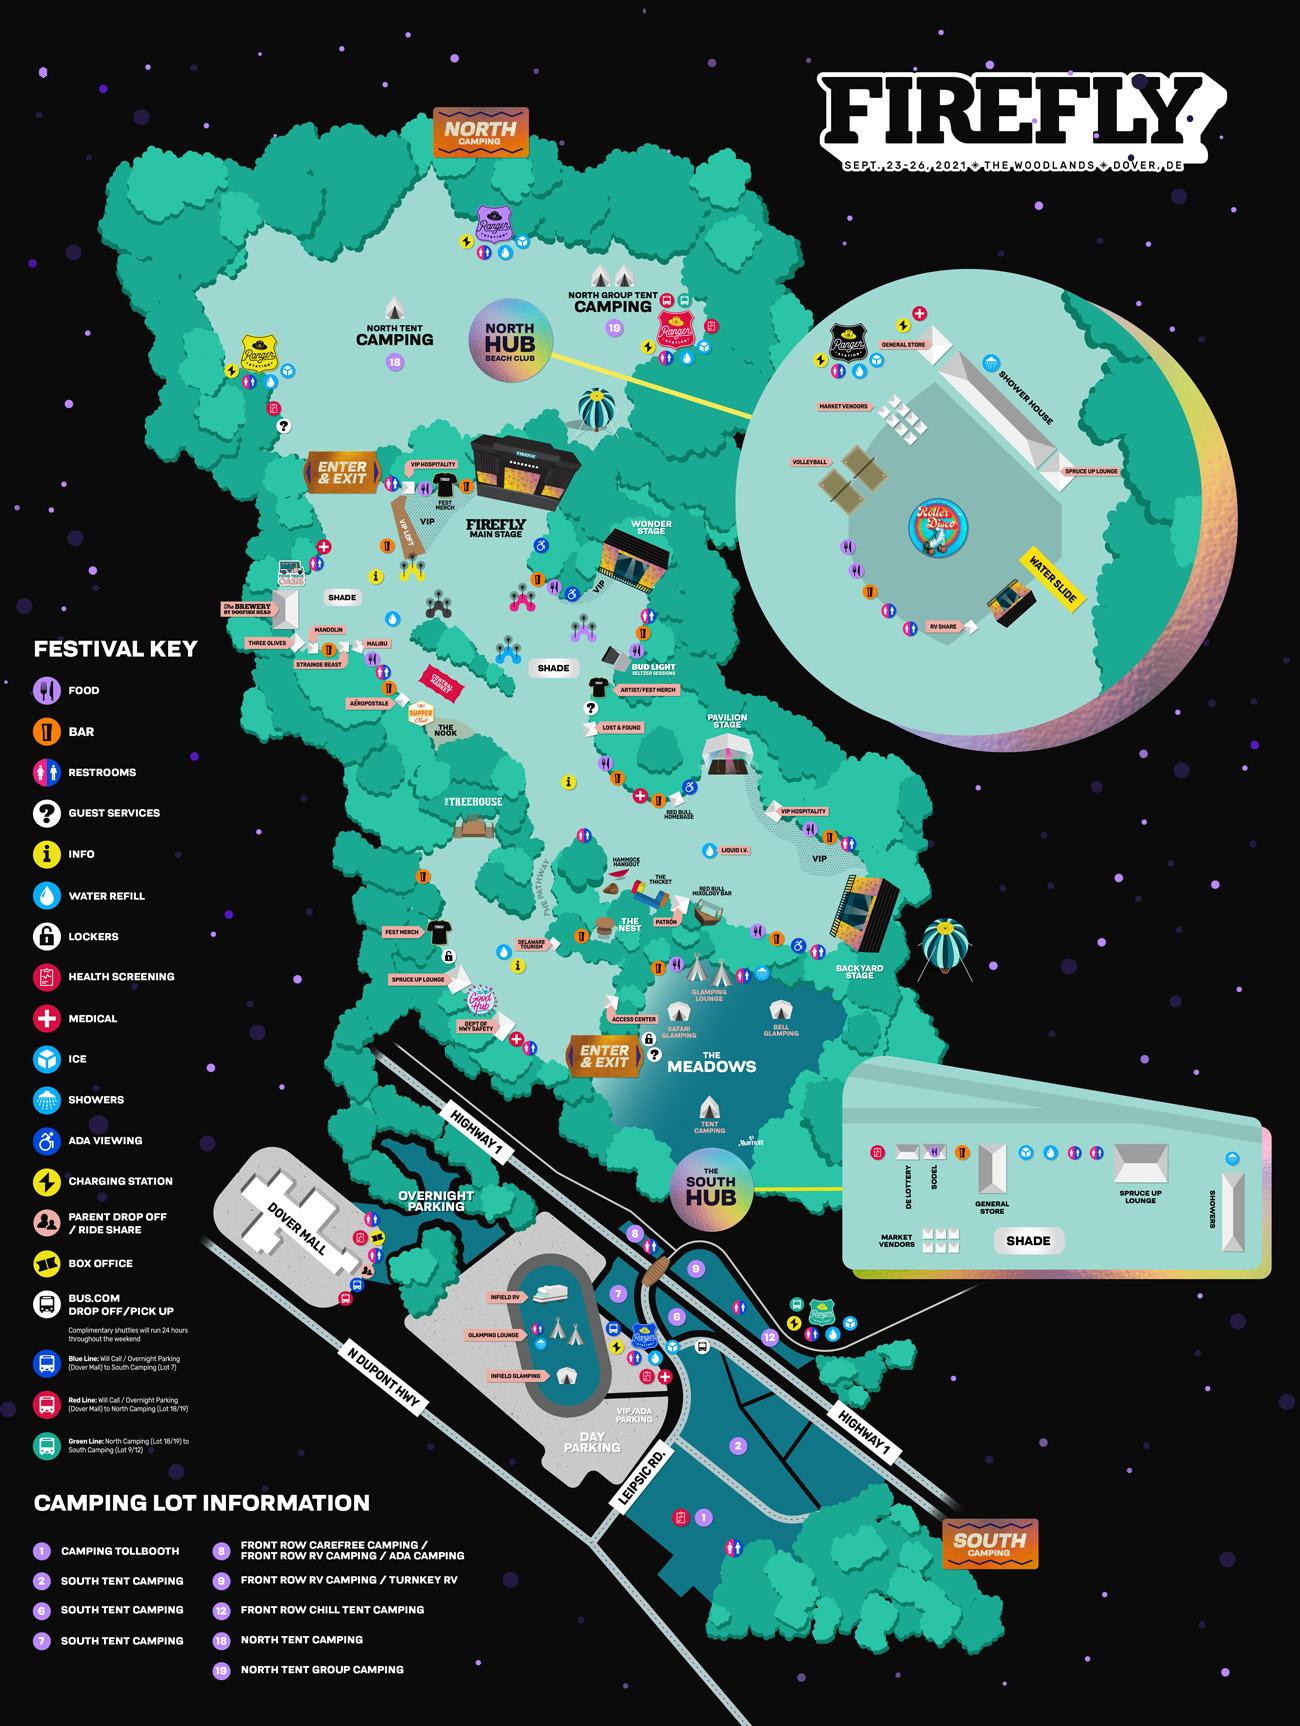 Firefly map